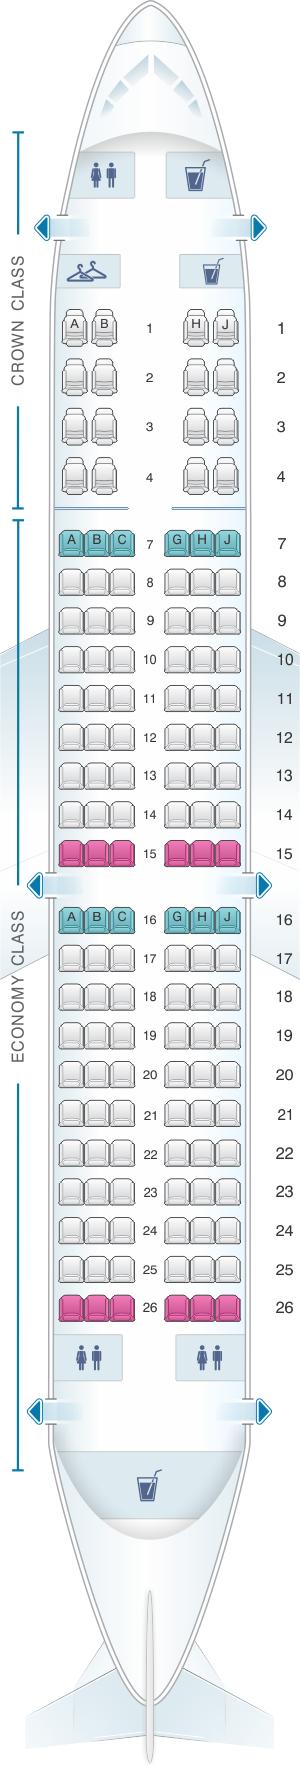 Seat map for Royal Jordanian Airbus A320 200